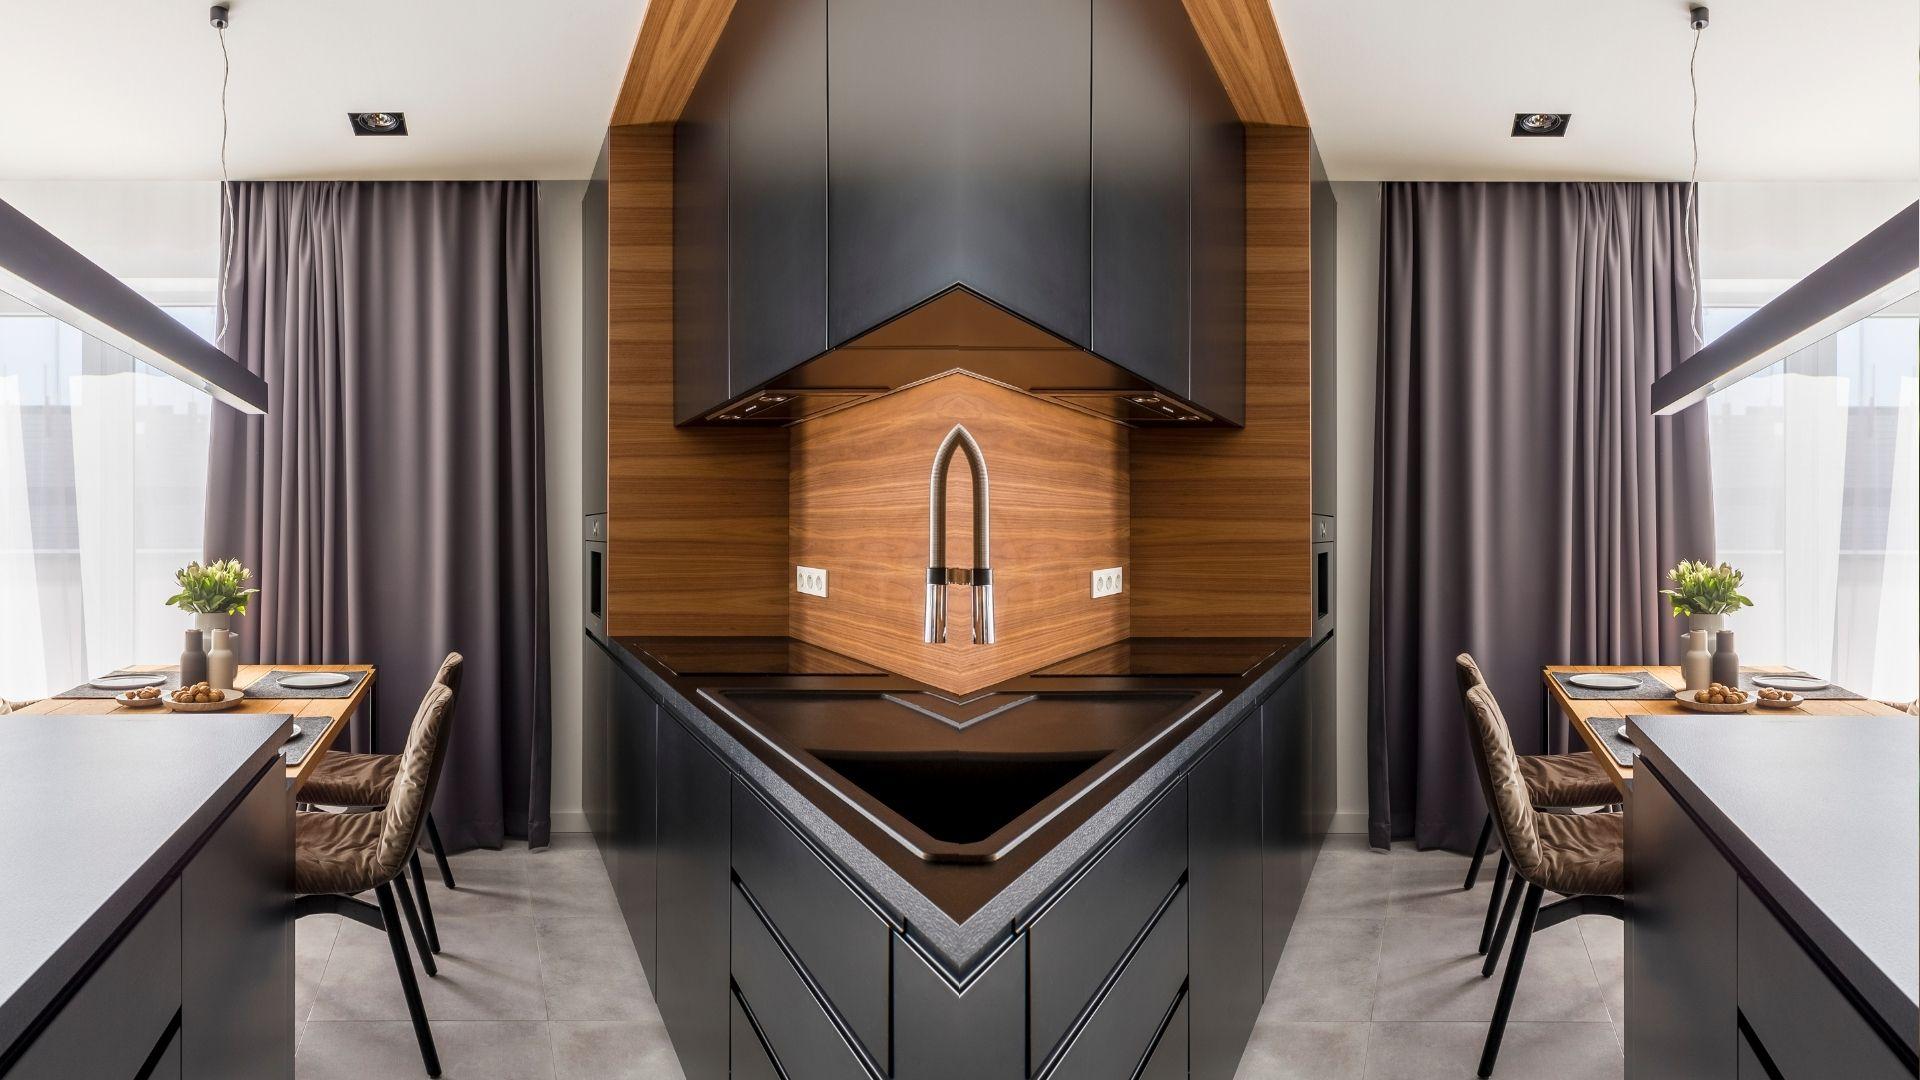 Black Cabinets upscale kitchen pandemic money saving denver contractor adu